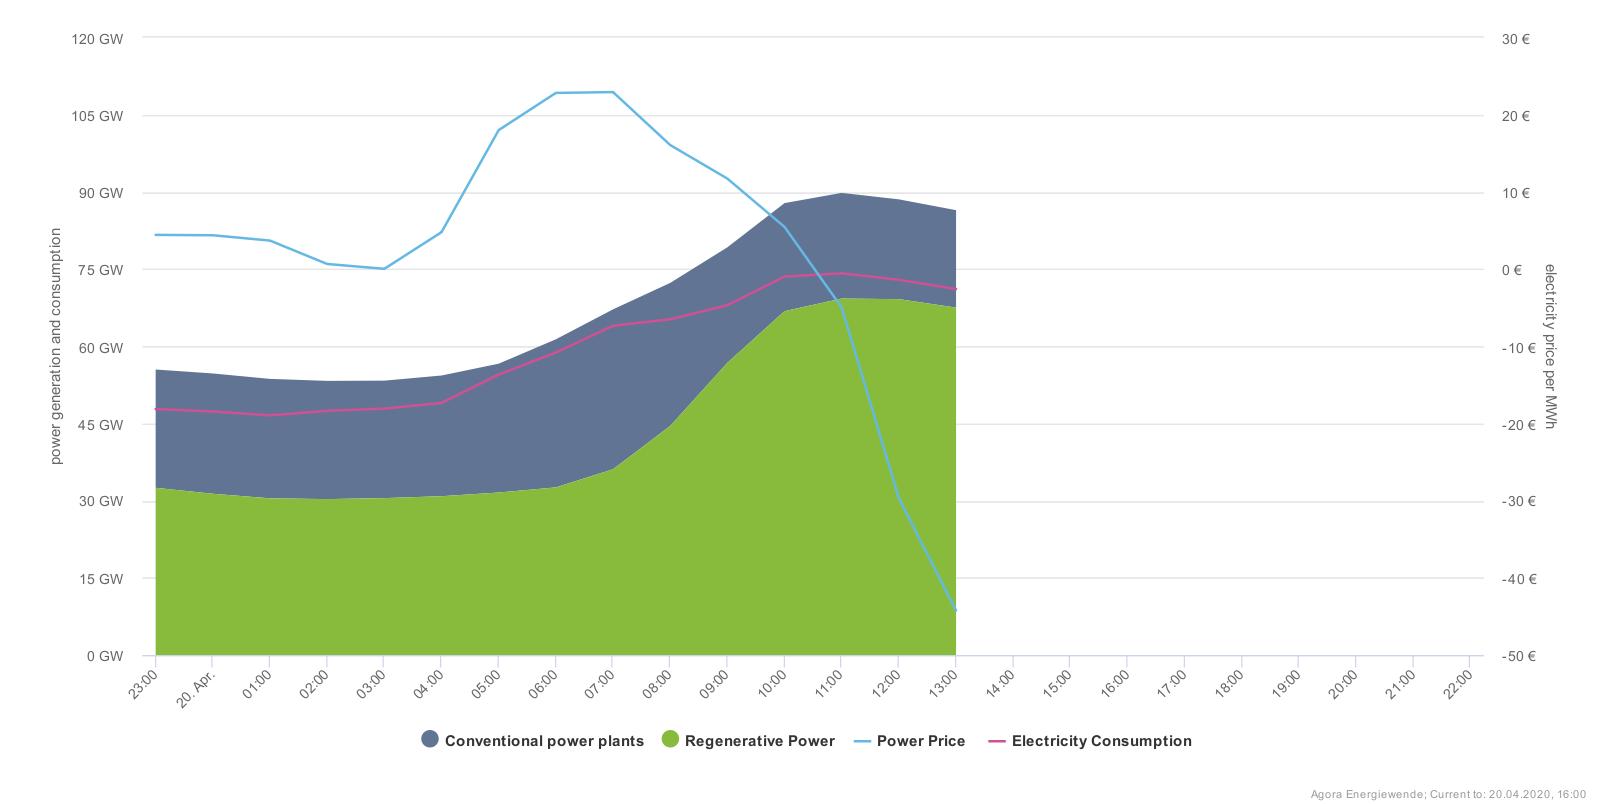 German power generation